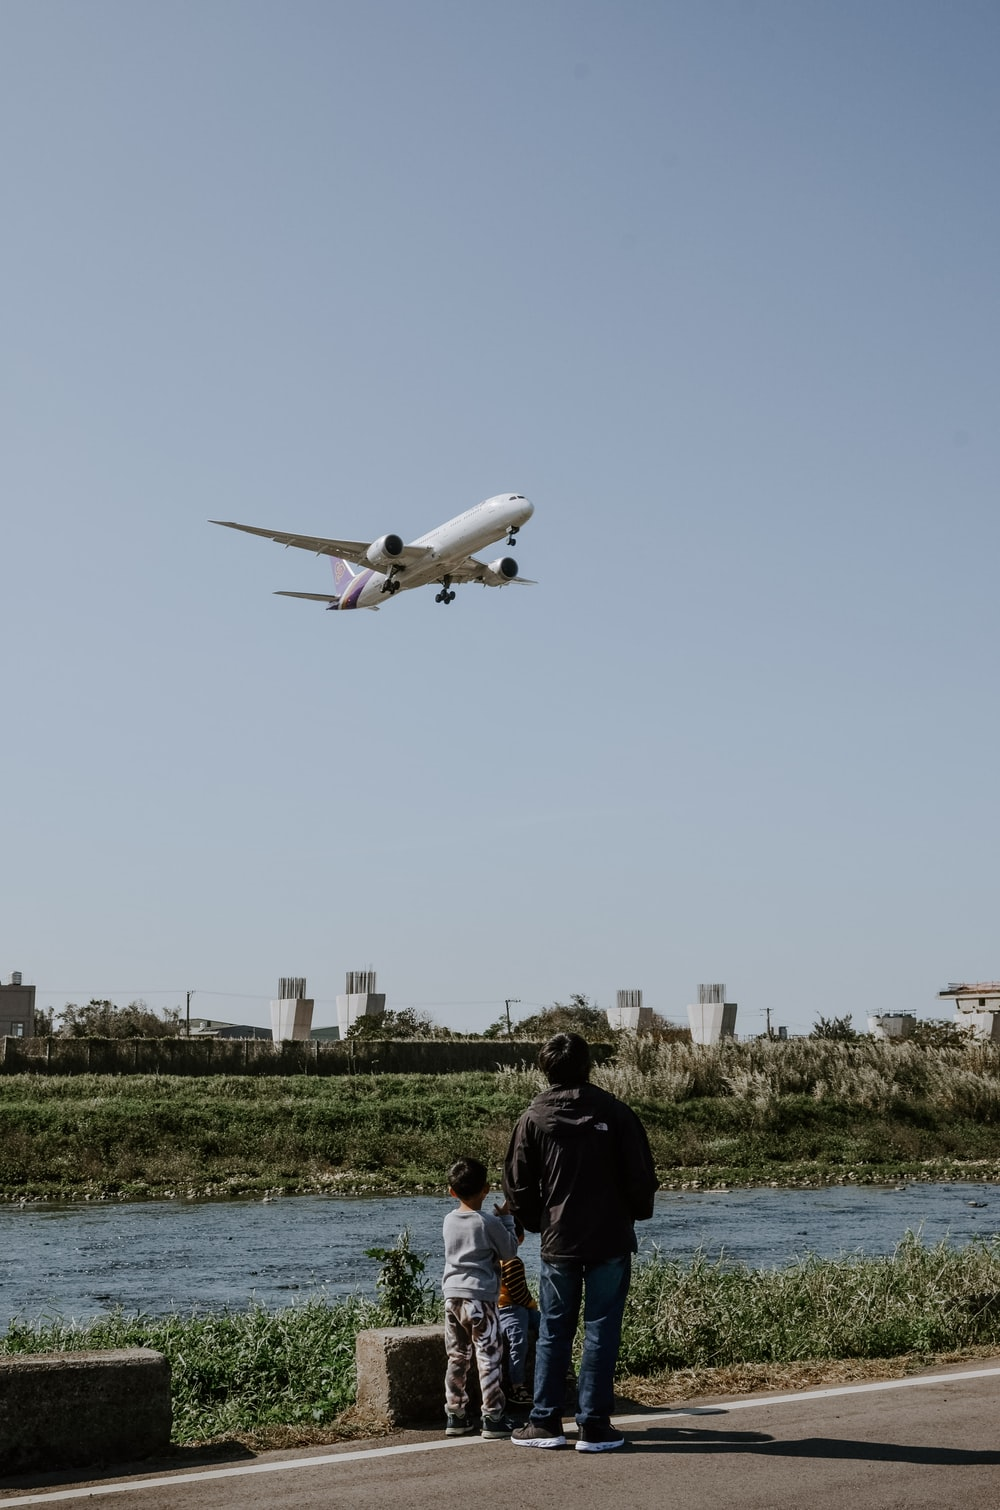 man in black jacket standing near white airplane during daytime